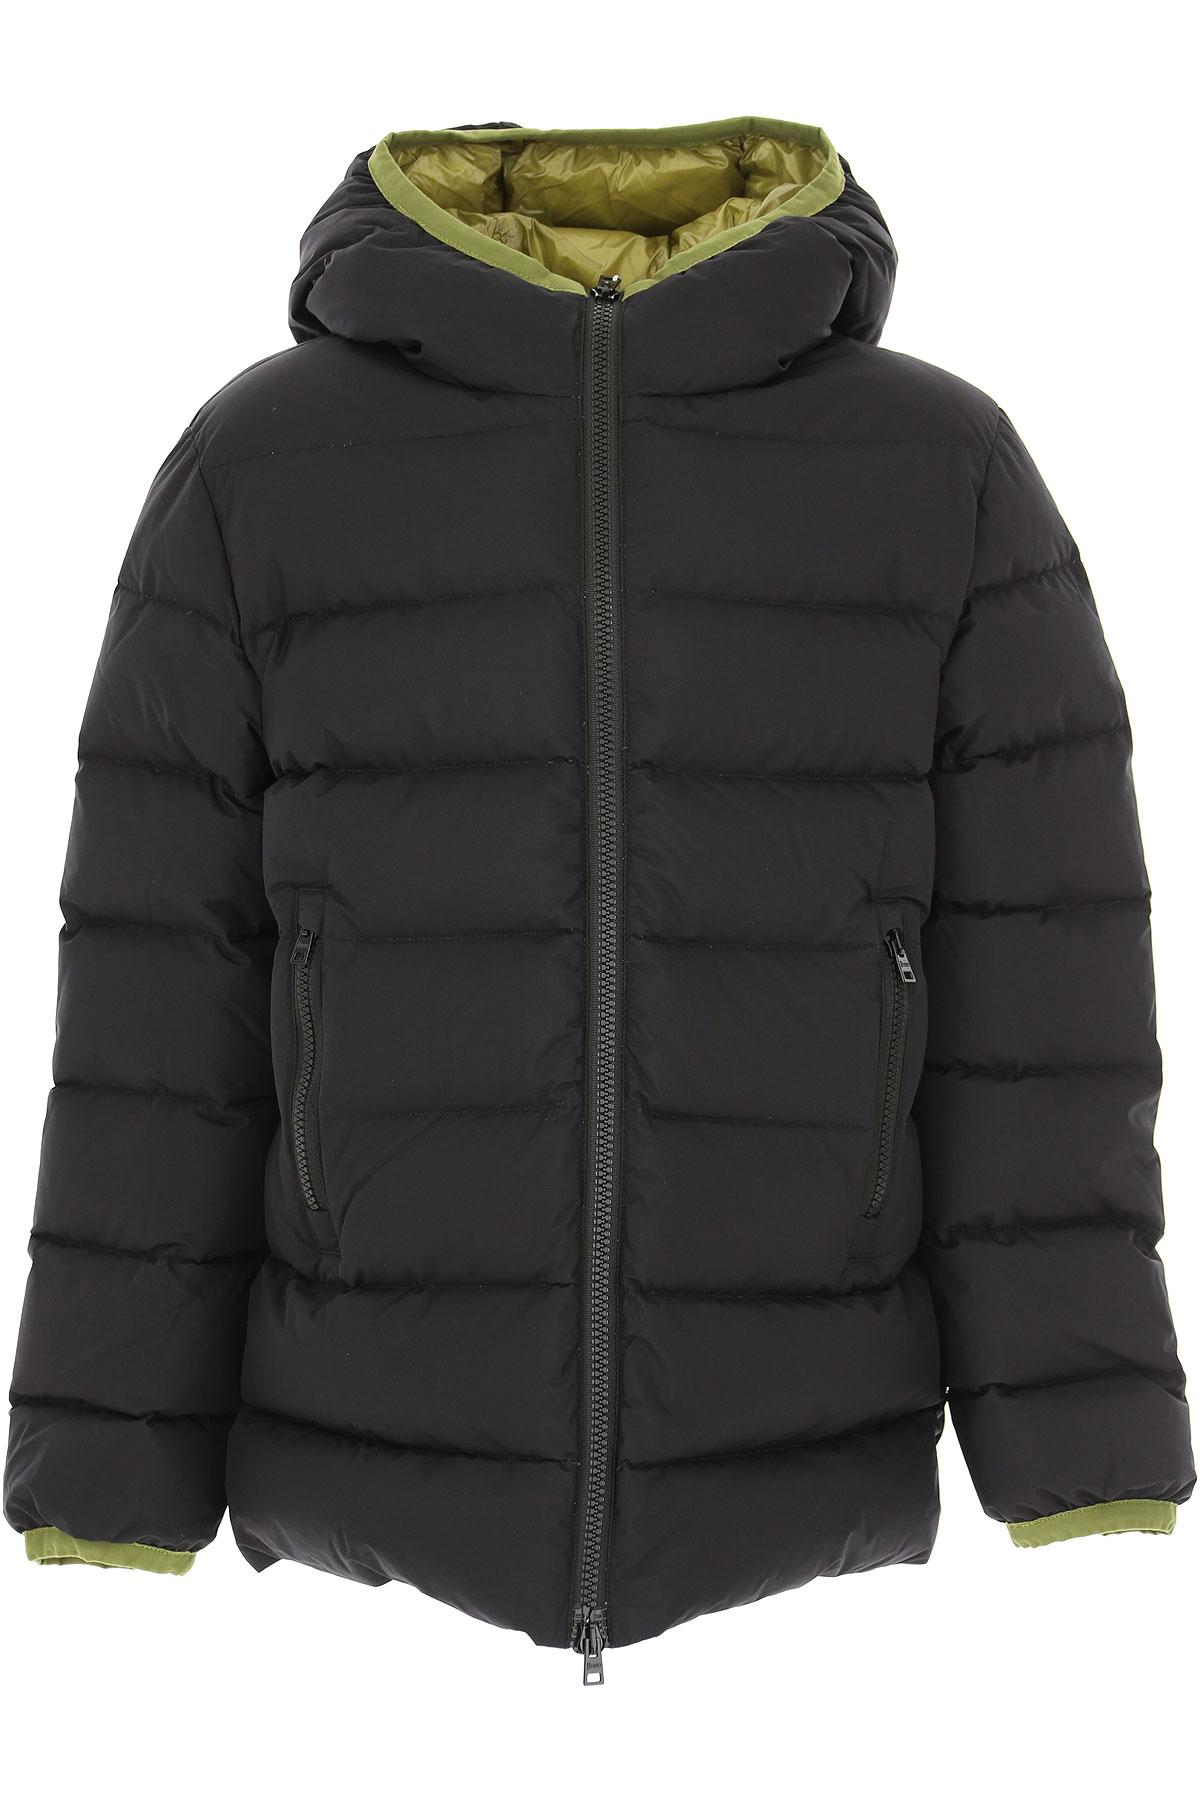 Image of Herno Boys Down Jacket for Kids, Puffer Ski Jacket, Black, polyamide, 2017, 10Y 14Y 8Y